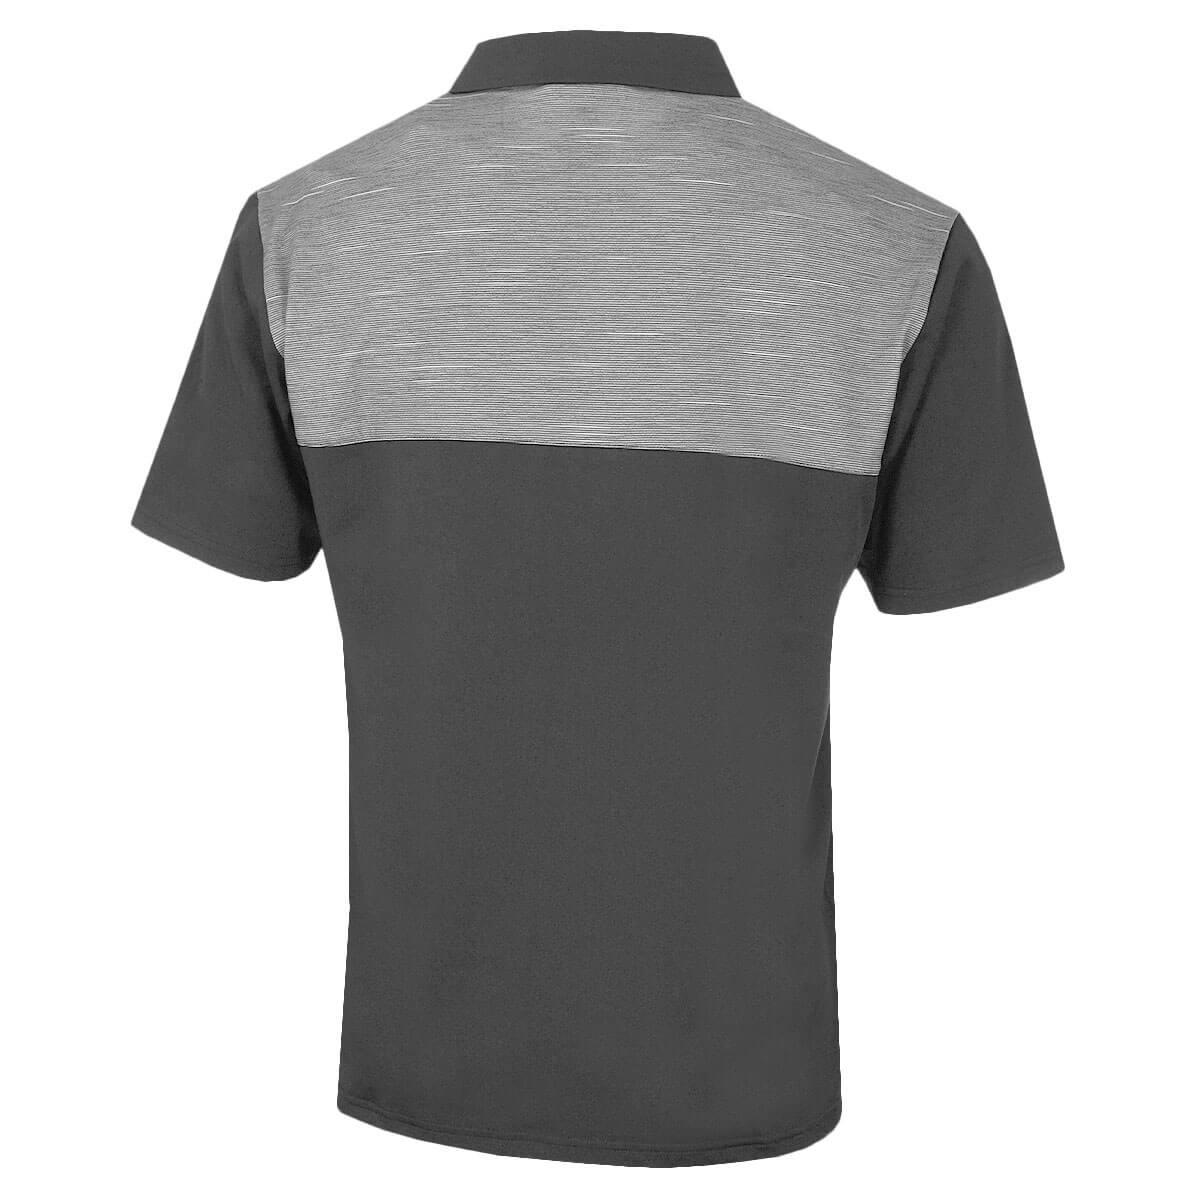 Island-Green-Mens-Golf-IGTS1891-Contrast-Yoke-Polo-Shirt-53-OFF-RRP thumbnail 5